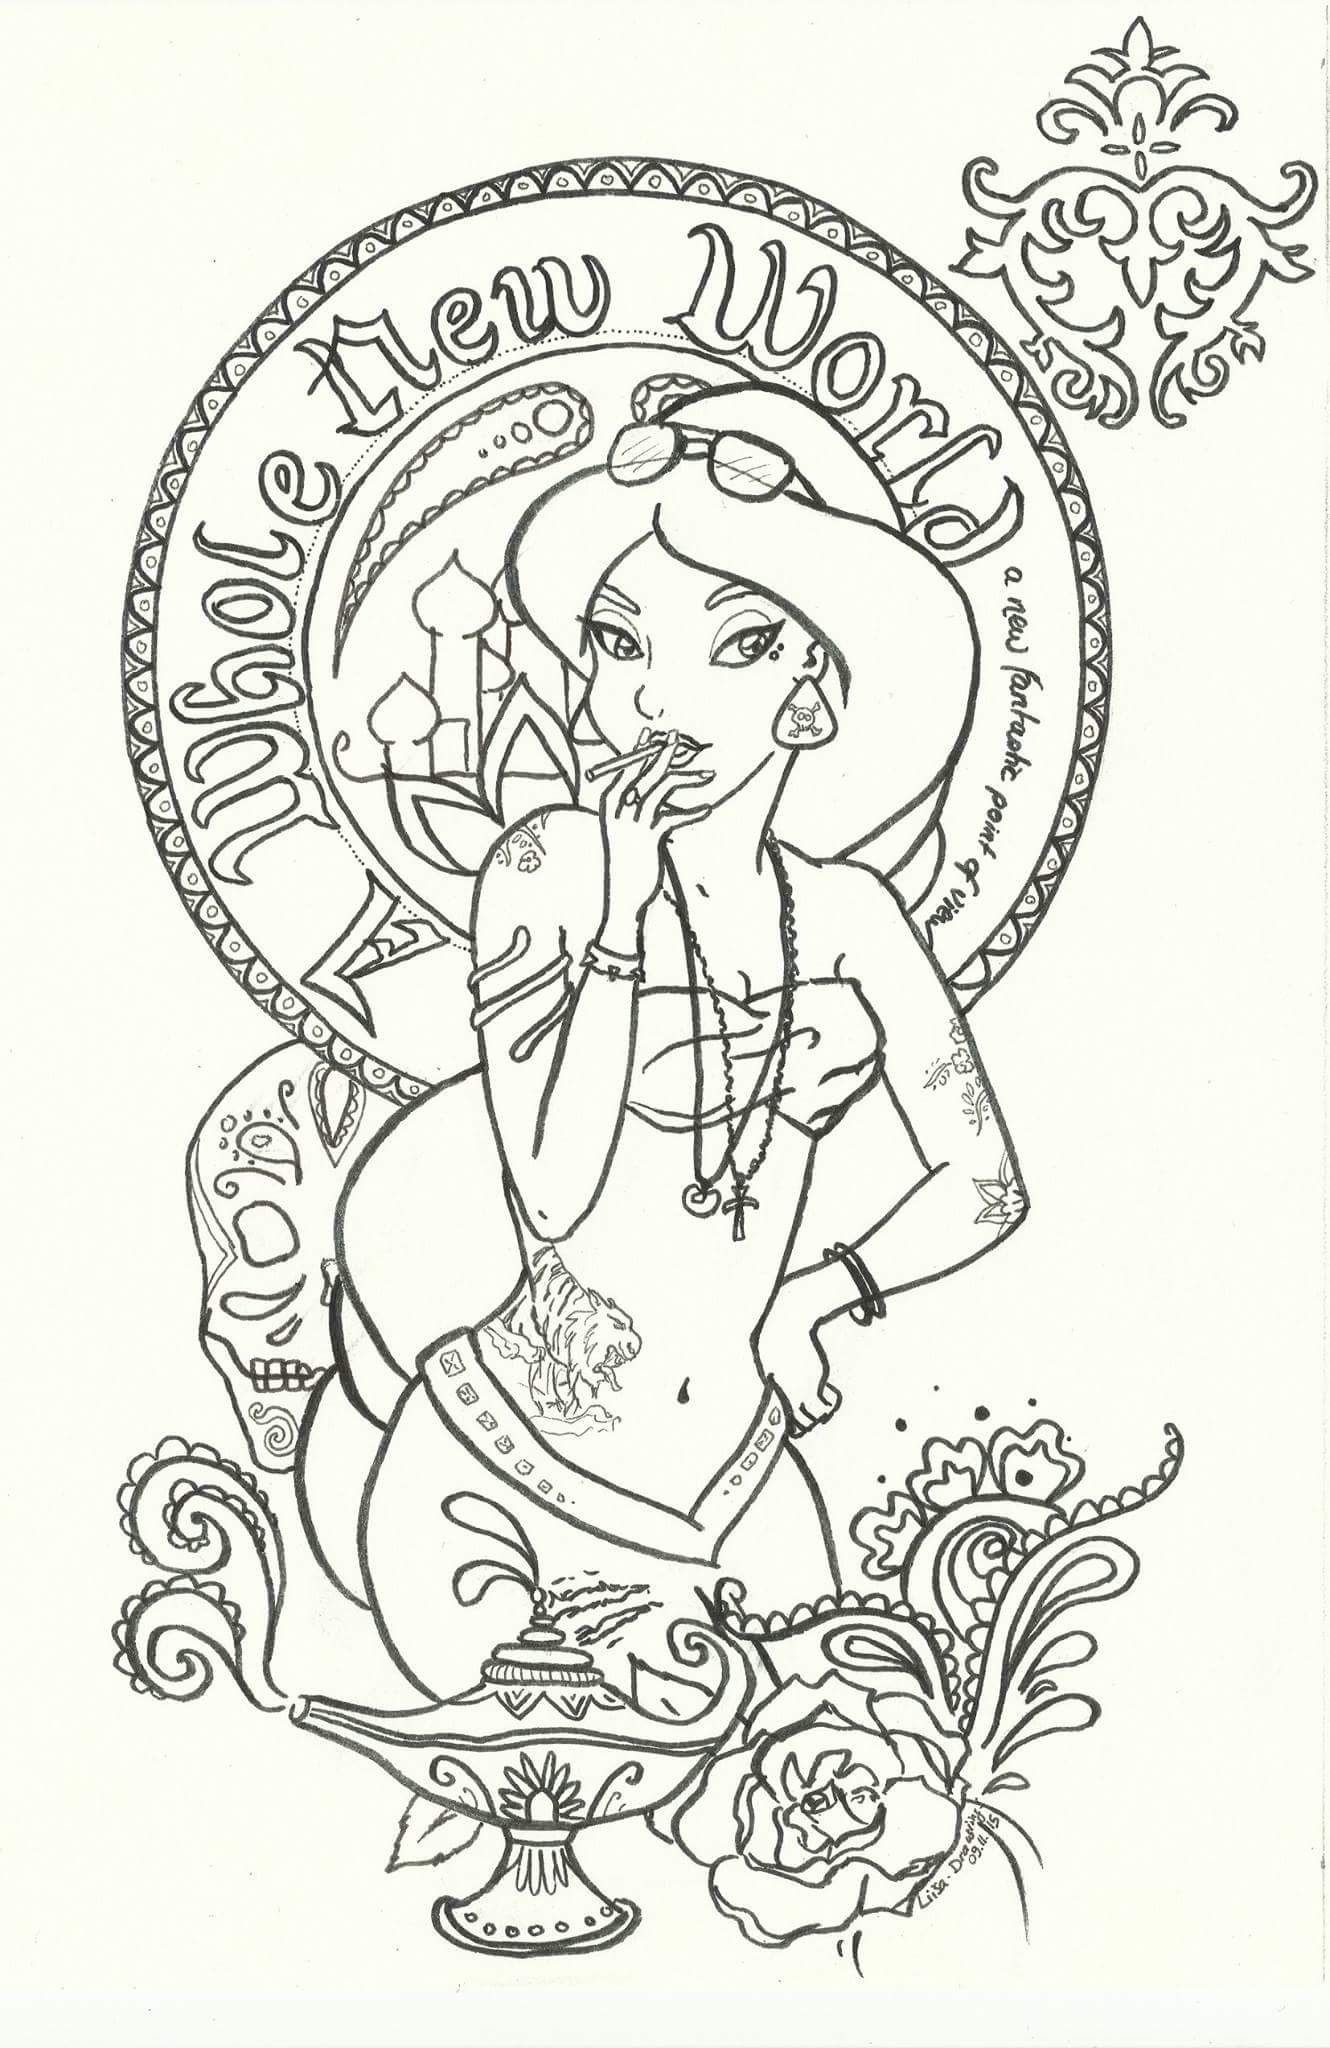 Pin By Shivsadh Prabhu On Disney 2 Princess Coloring Pages Disney Princess Coloring Pages Disney Princess Colors